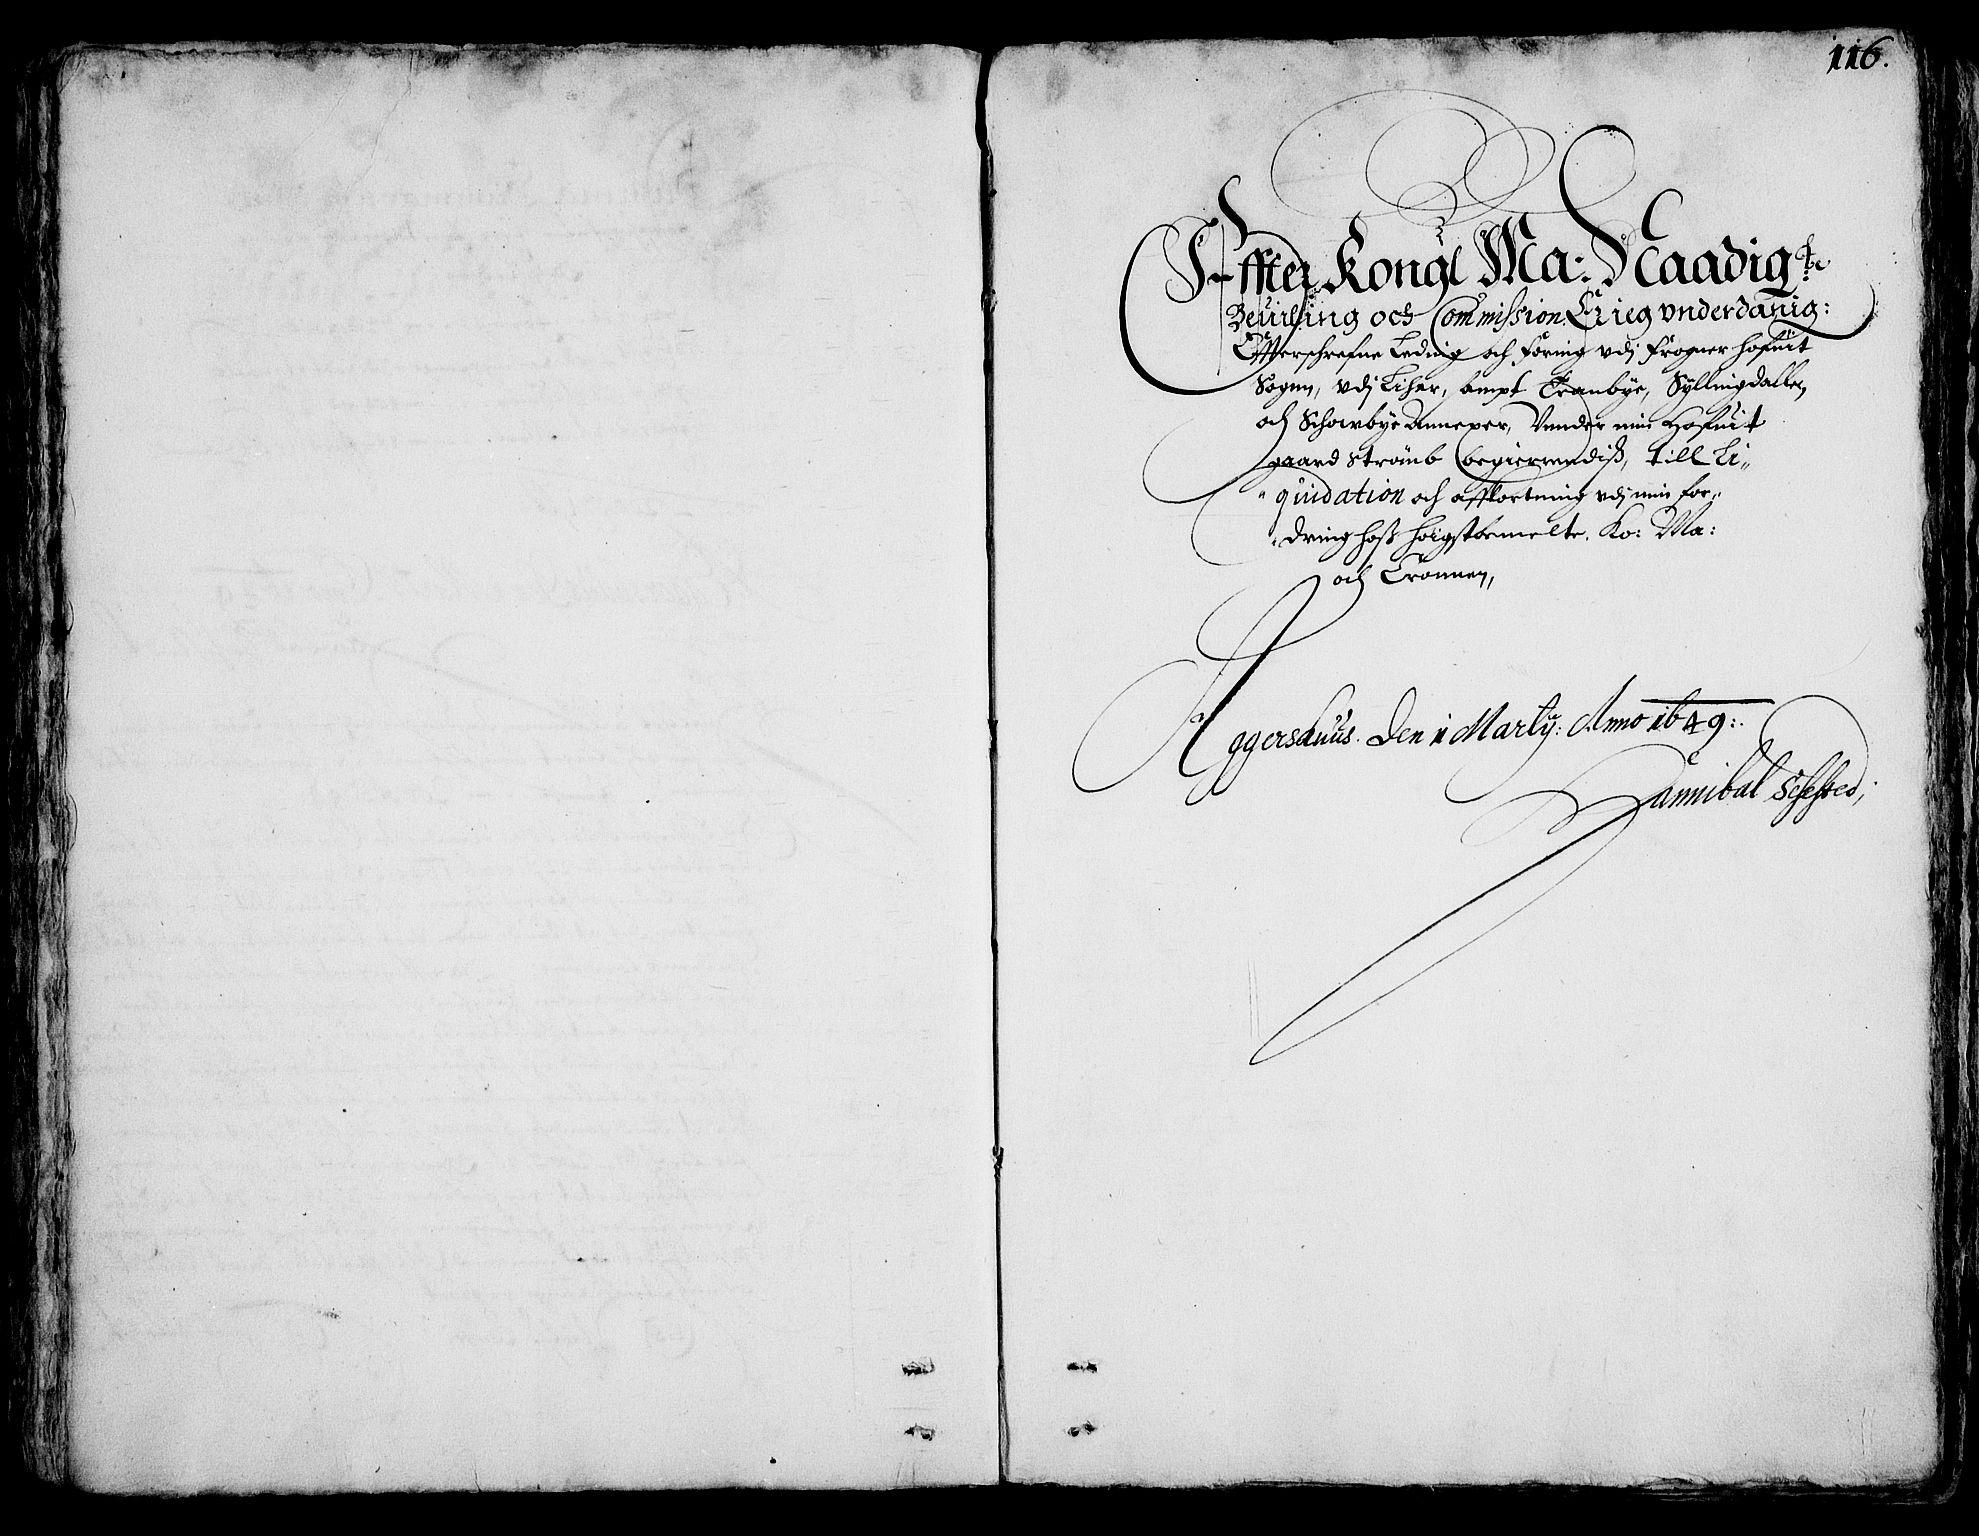 RA, Rentekammeret inntil 1814, Realistisk ordnet avdeling, On/L0001: Statens gods, 1651, s. 115b-116a